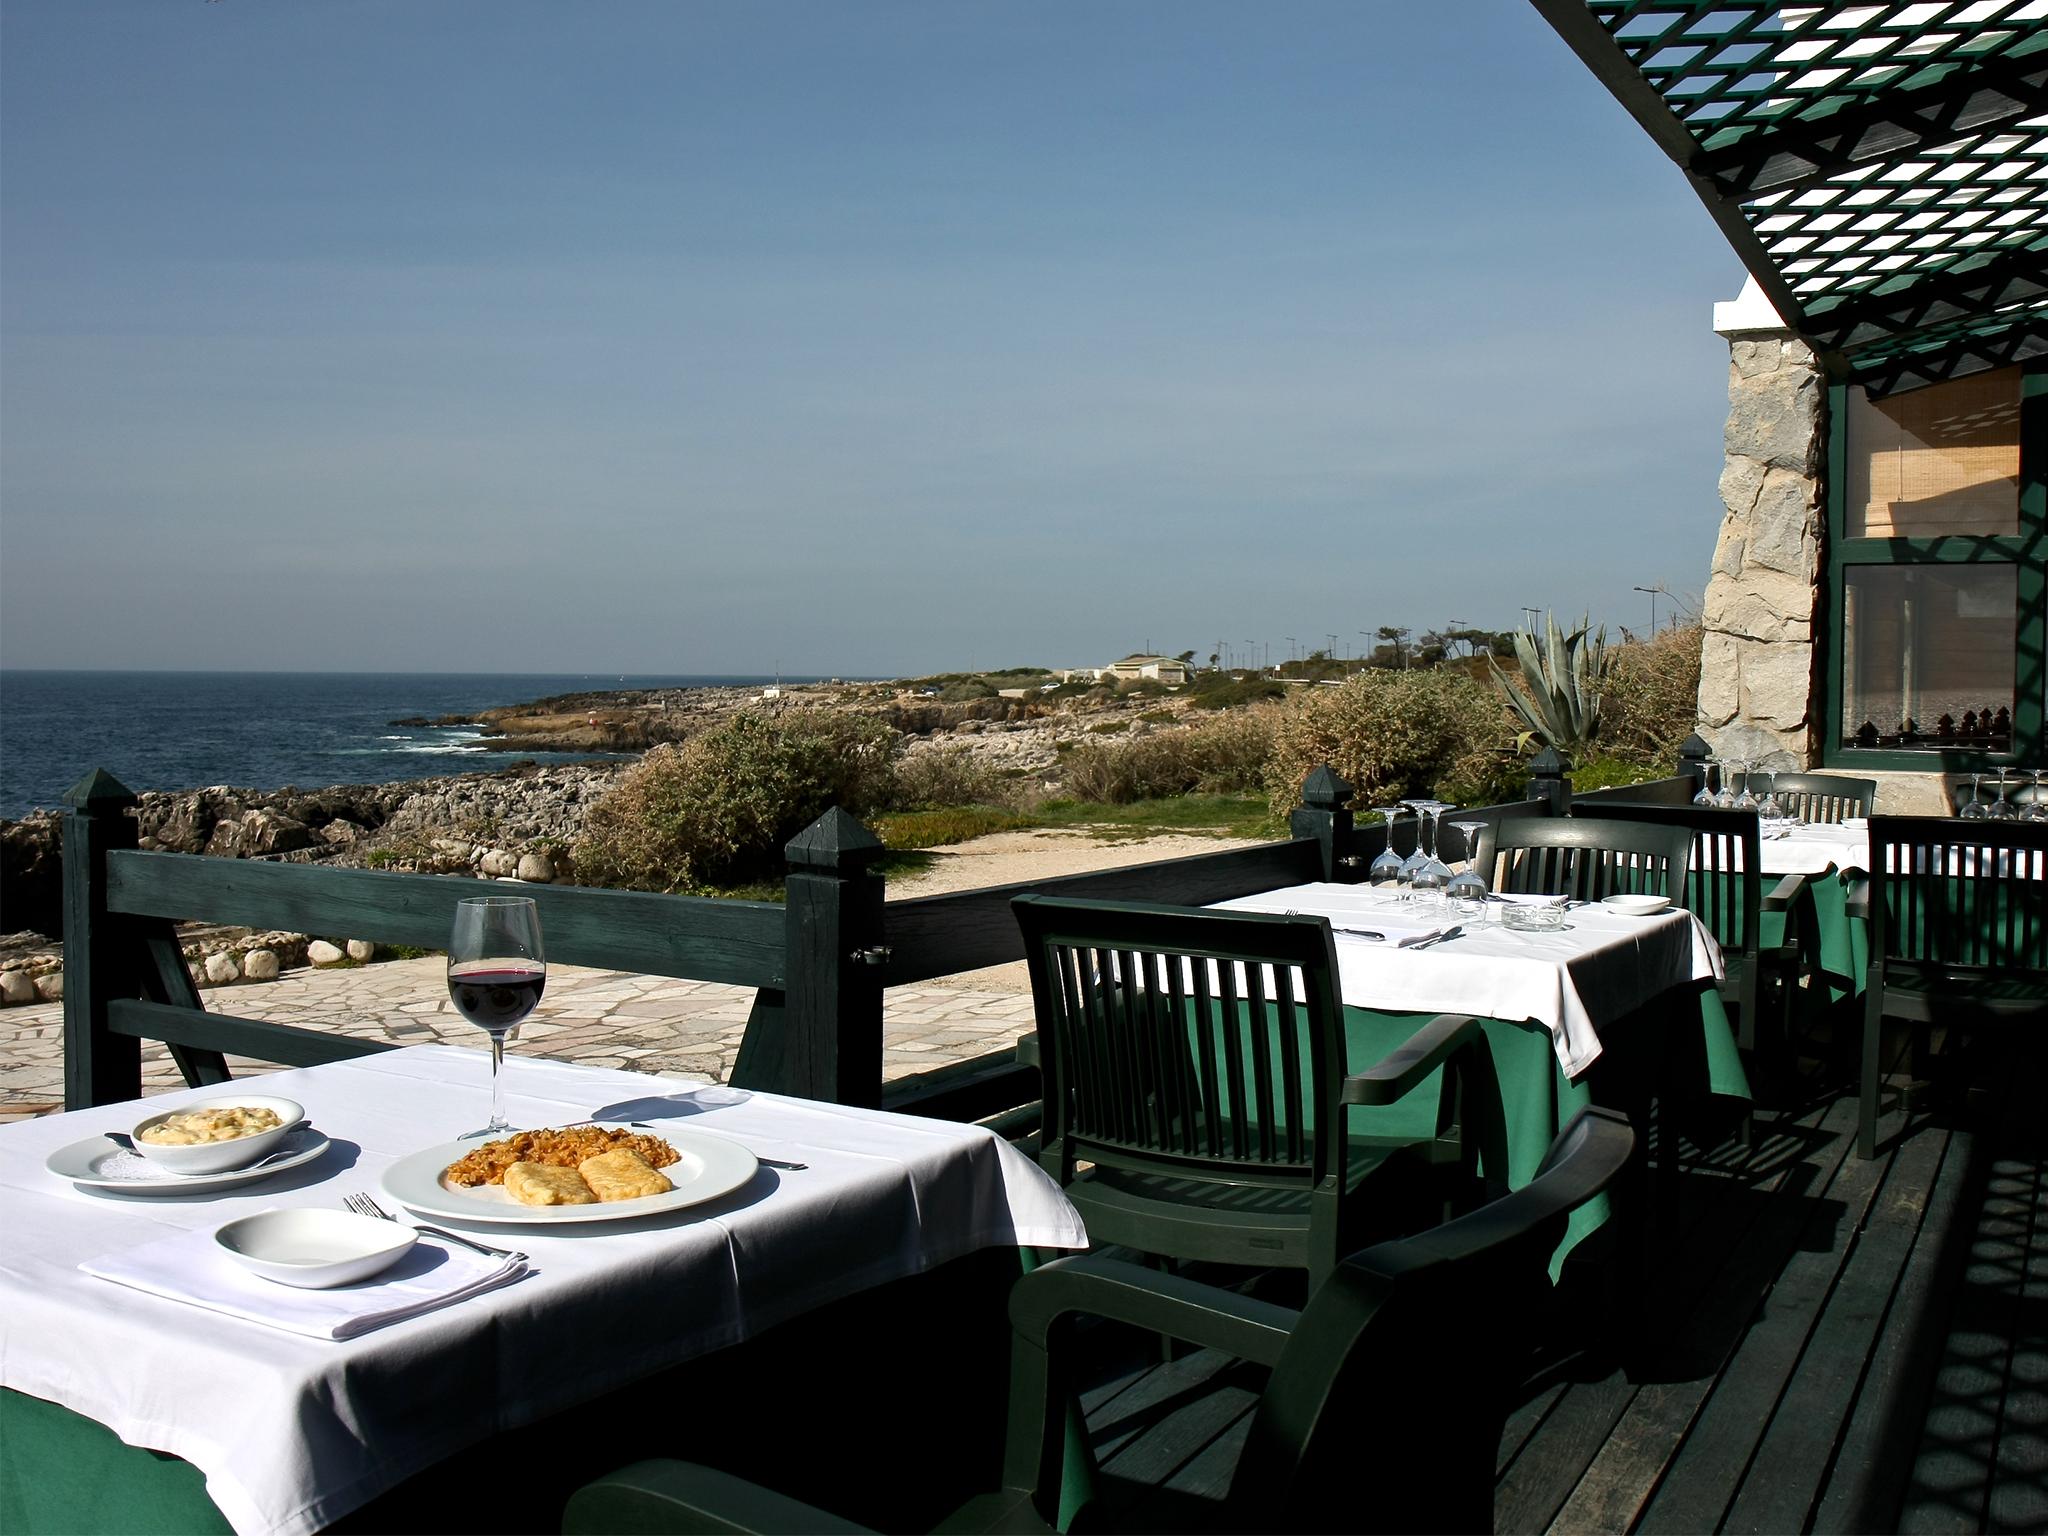 Restaurante, Peixe e Mariscos, Monte Mar Cascais